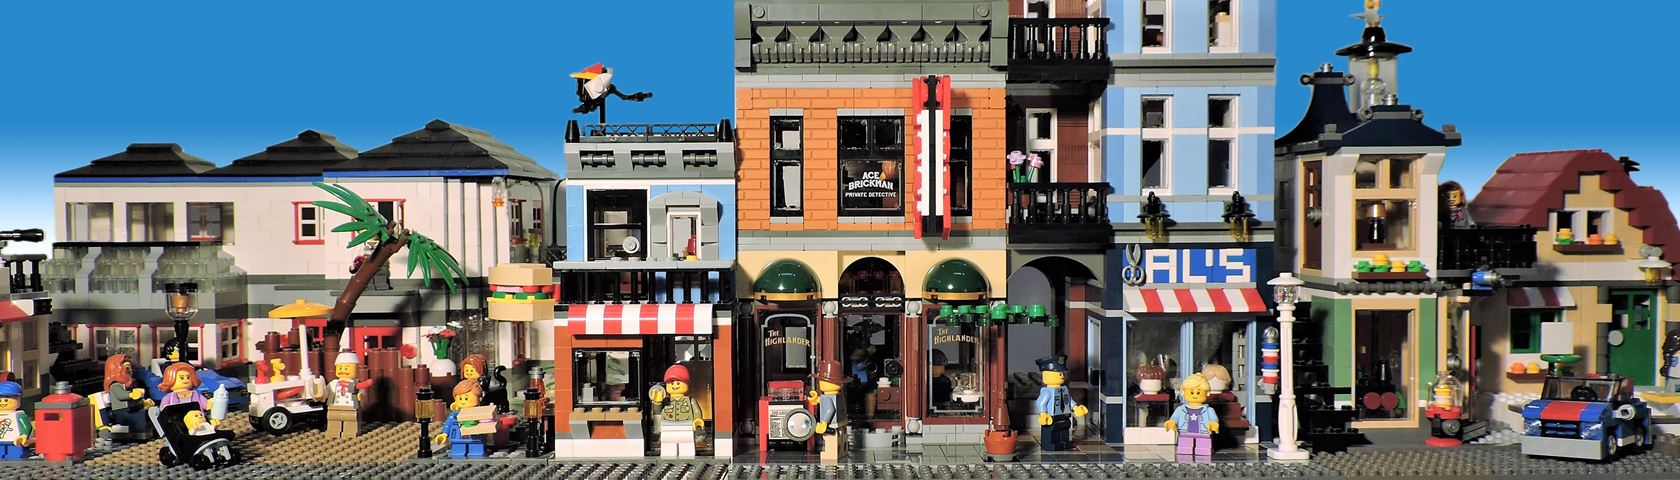 Lego Street